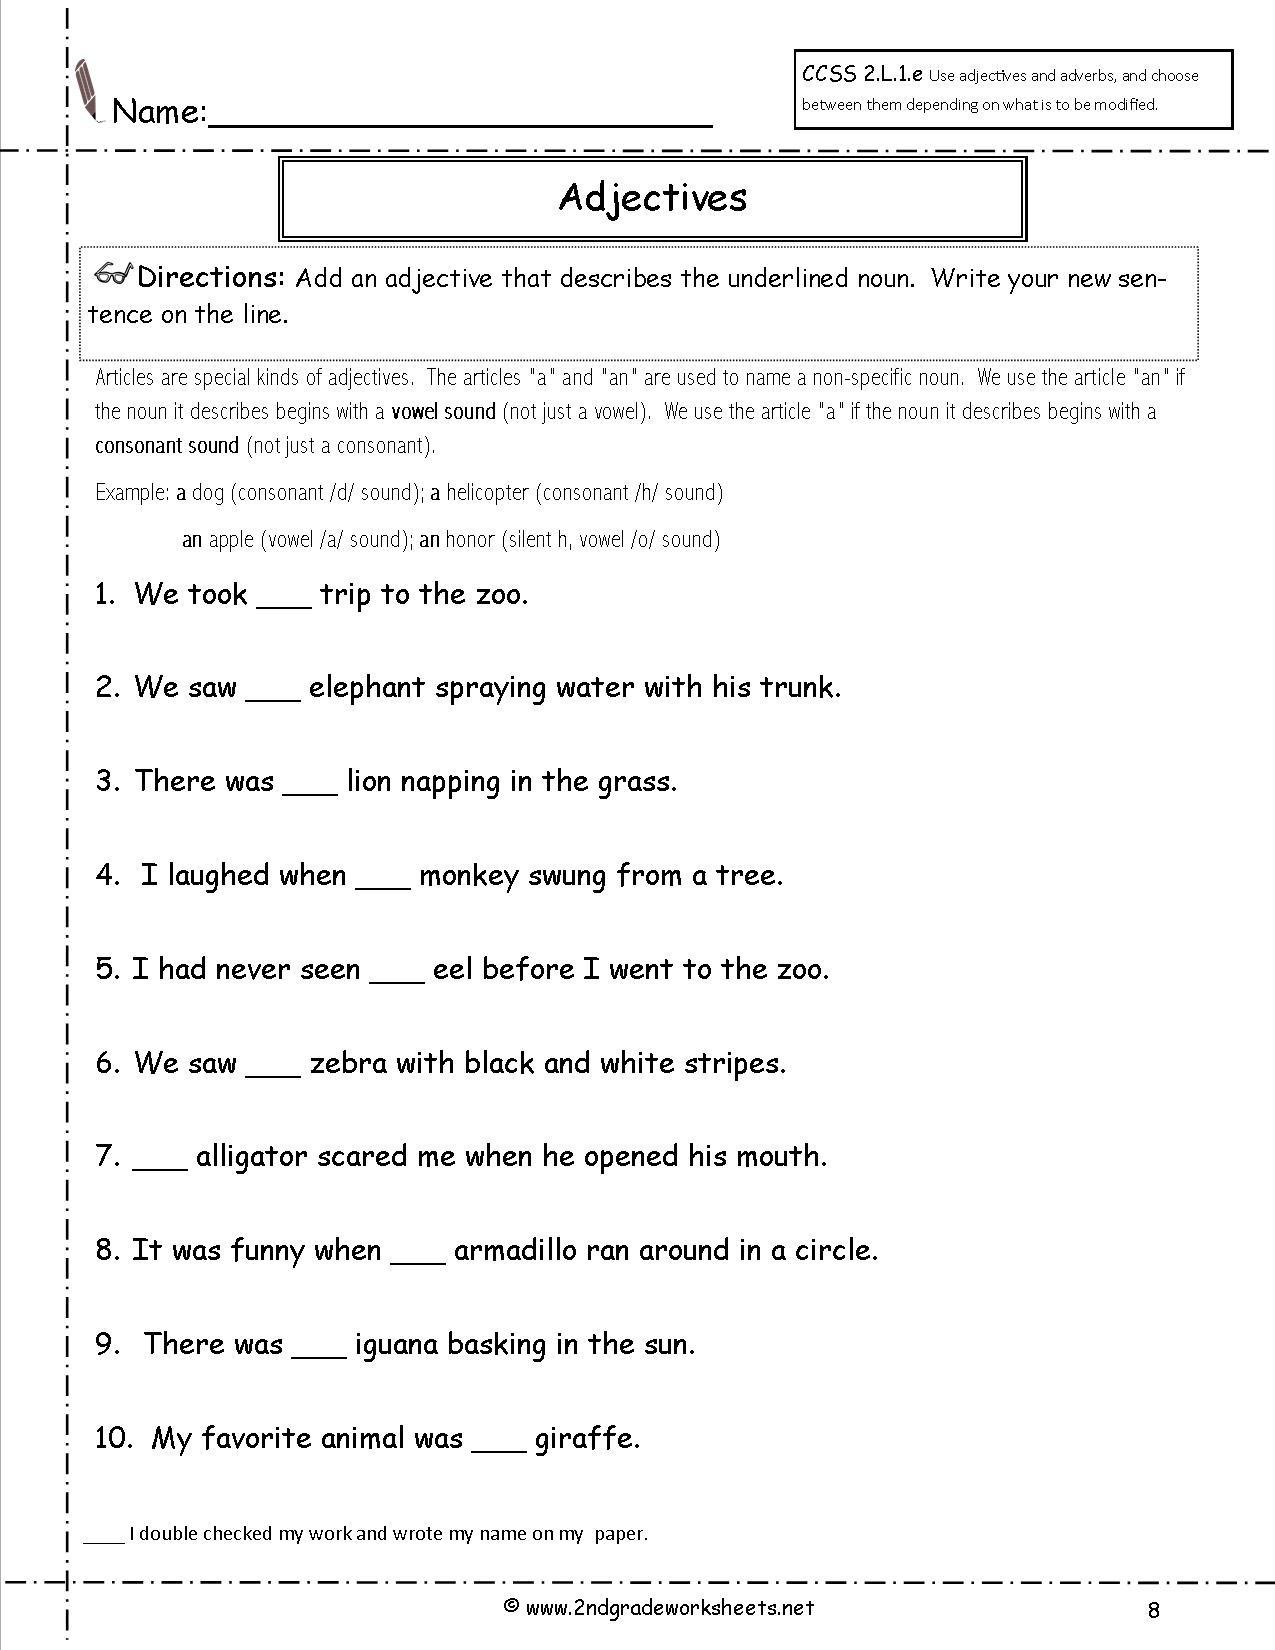 Free Language/grammar Worksheets And Printouts - Free Printable Grammar Worksheets